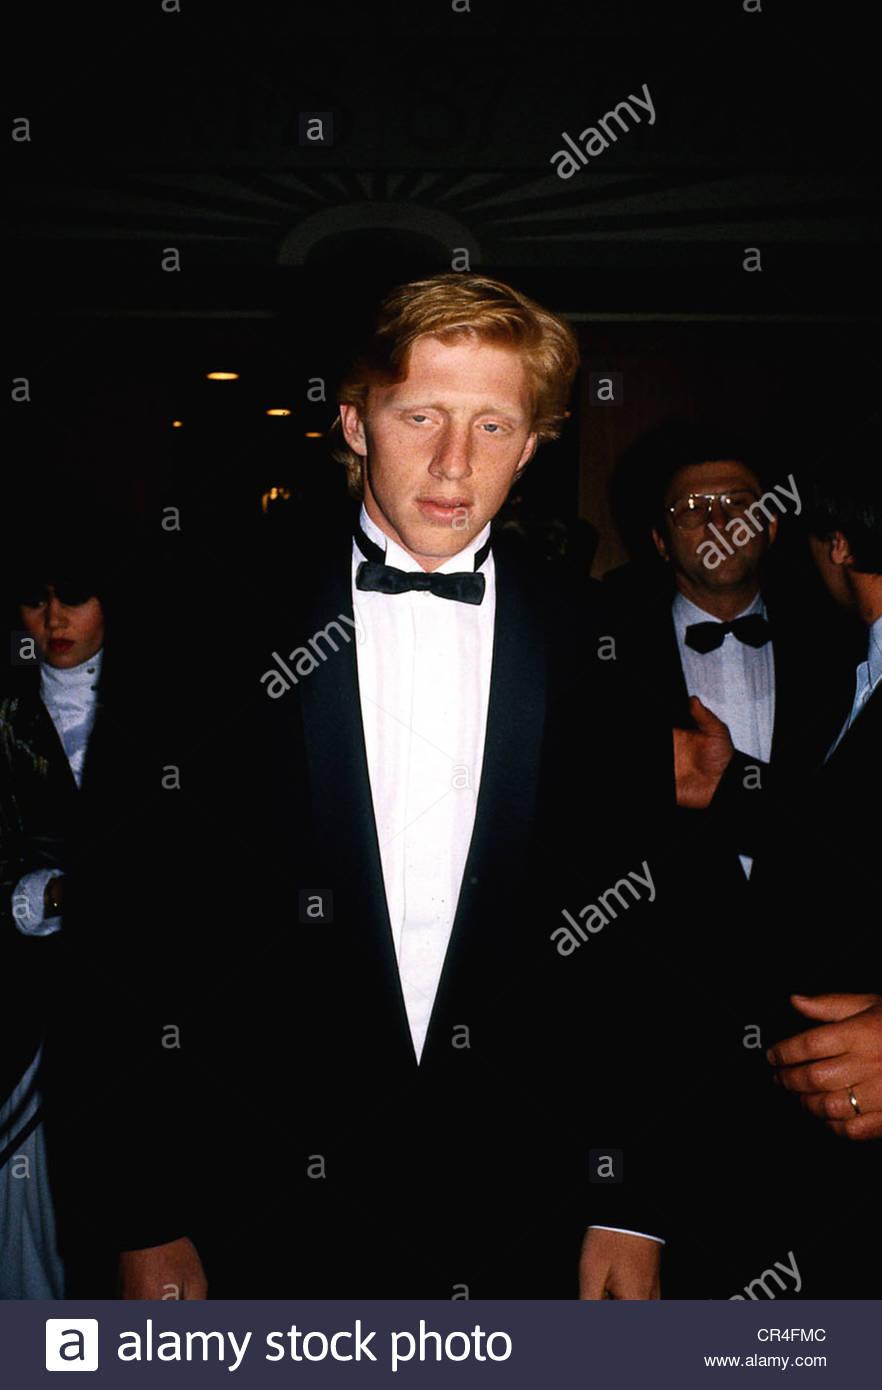 Becker, Boris, * 22.11.1967, German tennis player, half length, at a social event, Munich, early 1980s, dinner jacket, - Stock Image